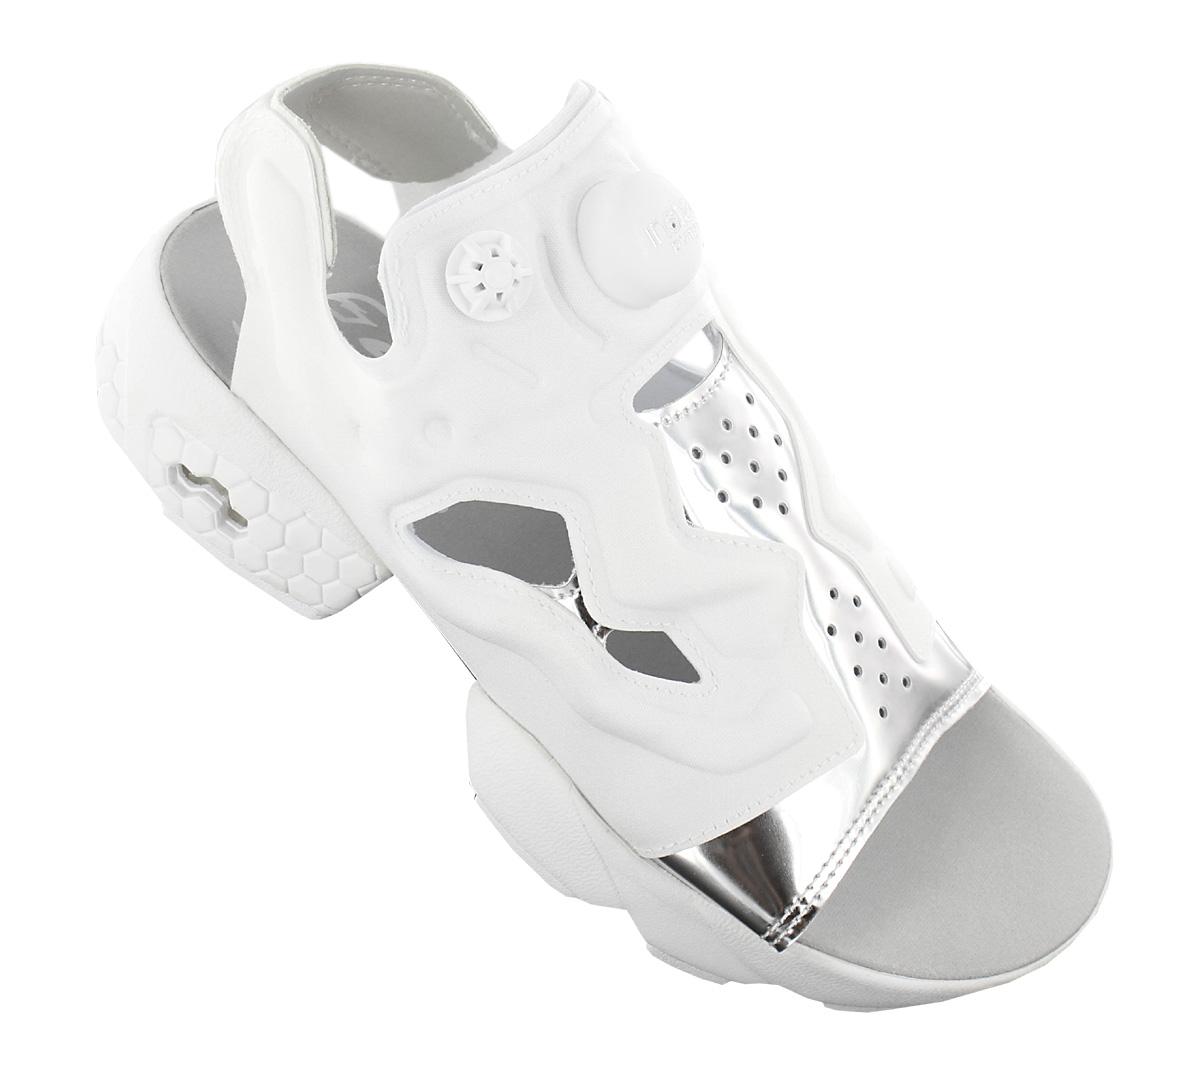 Details zu Reebok Instapump Fury Sandal Mag Damen Sandalen Sneaker Plateau BD3186 Weiß NEU